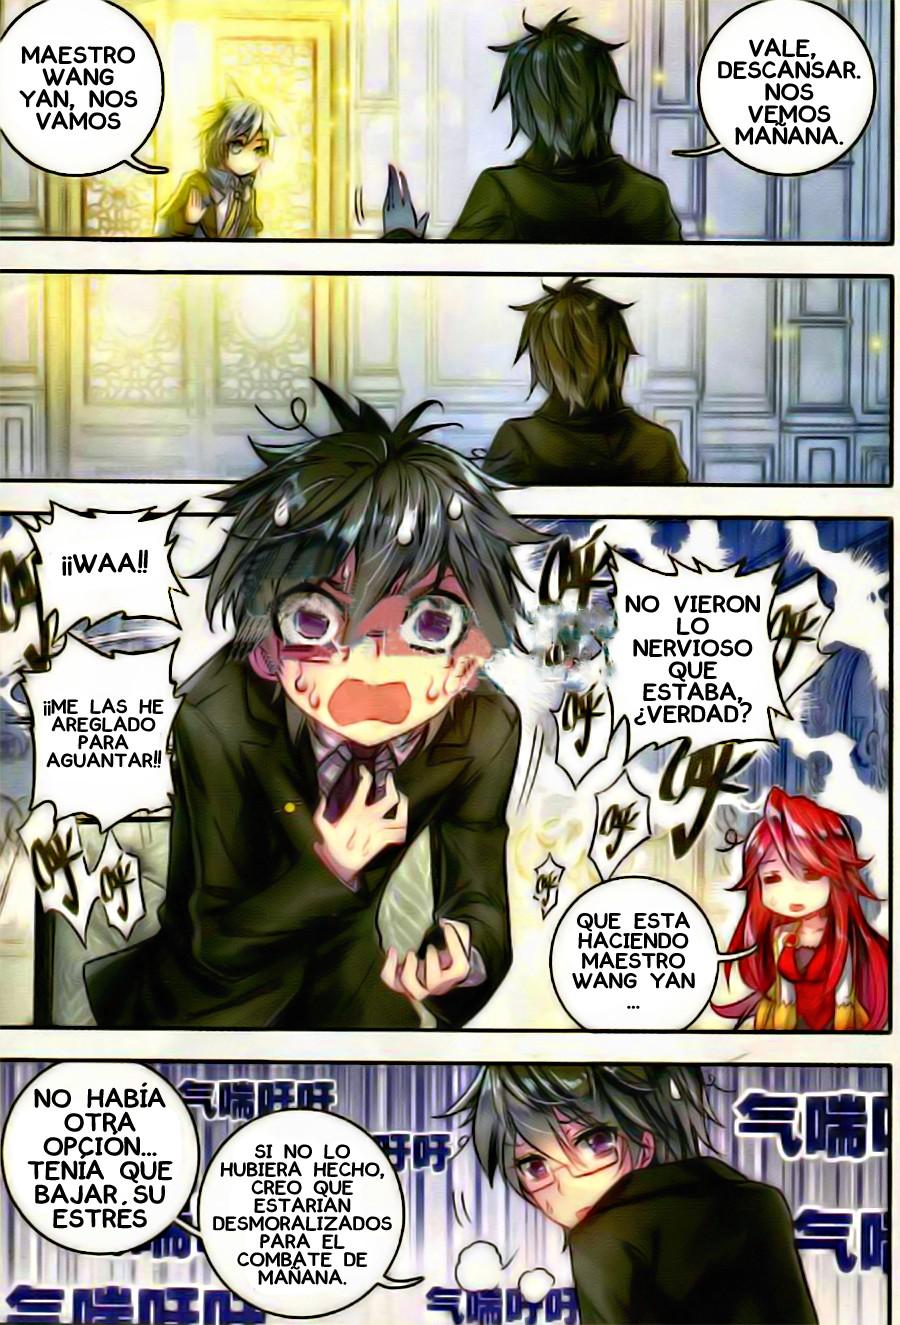 http://c5.ninemanga.com/es_manga/33/16417/439091/b57e6bb1136ccd44f69355d9daf67e2c.jpg Page 8